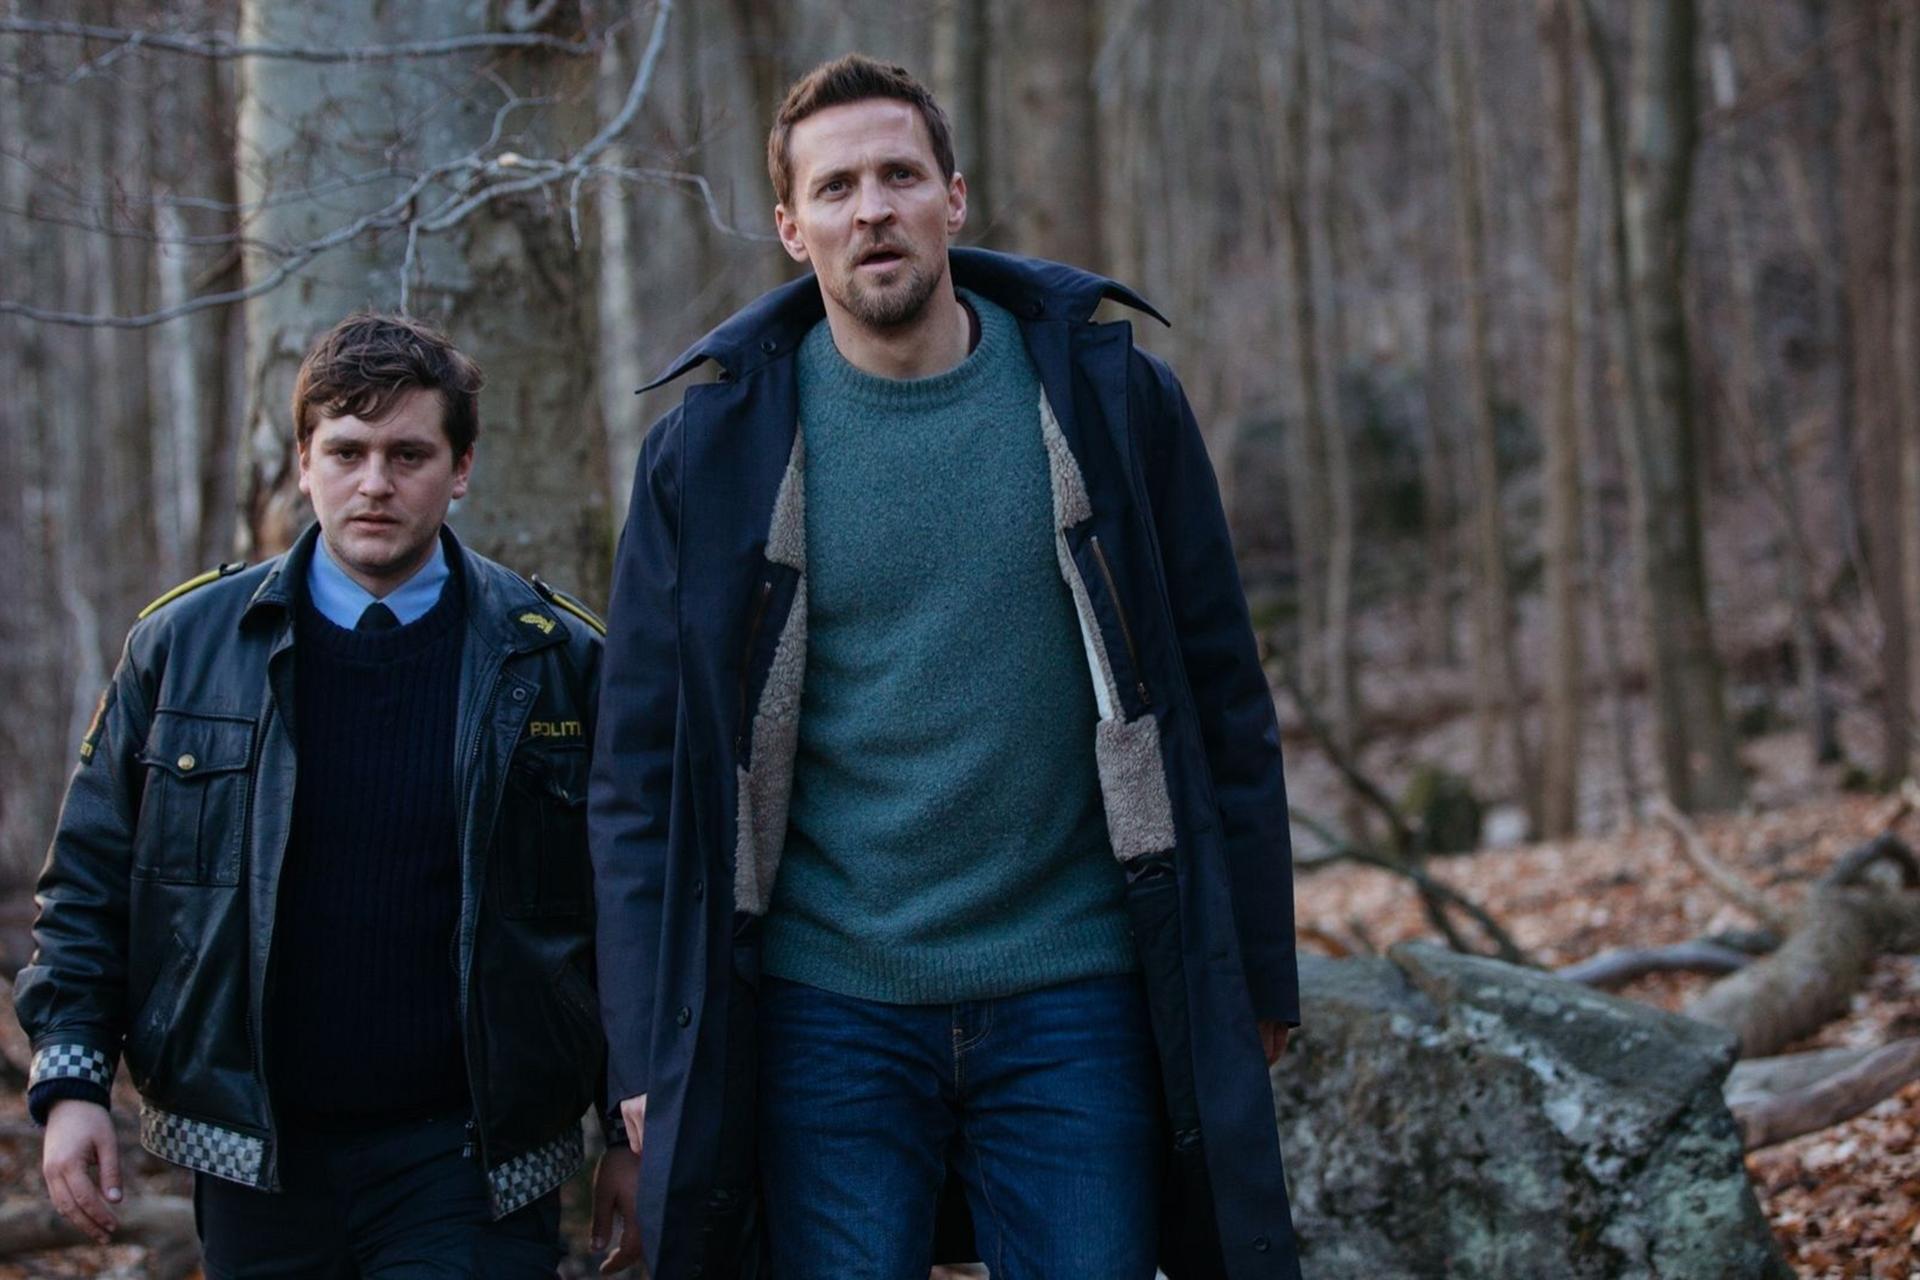 En Borderliner, serie noruega disponible en Netflix, un detective encubre un crimen